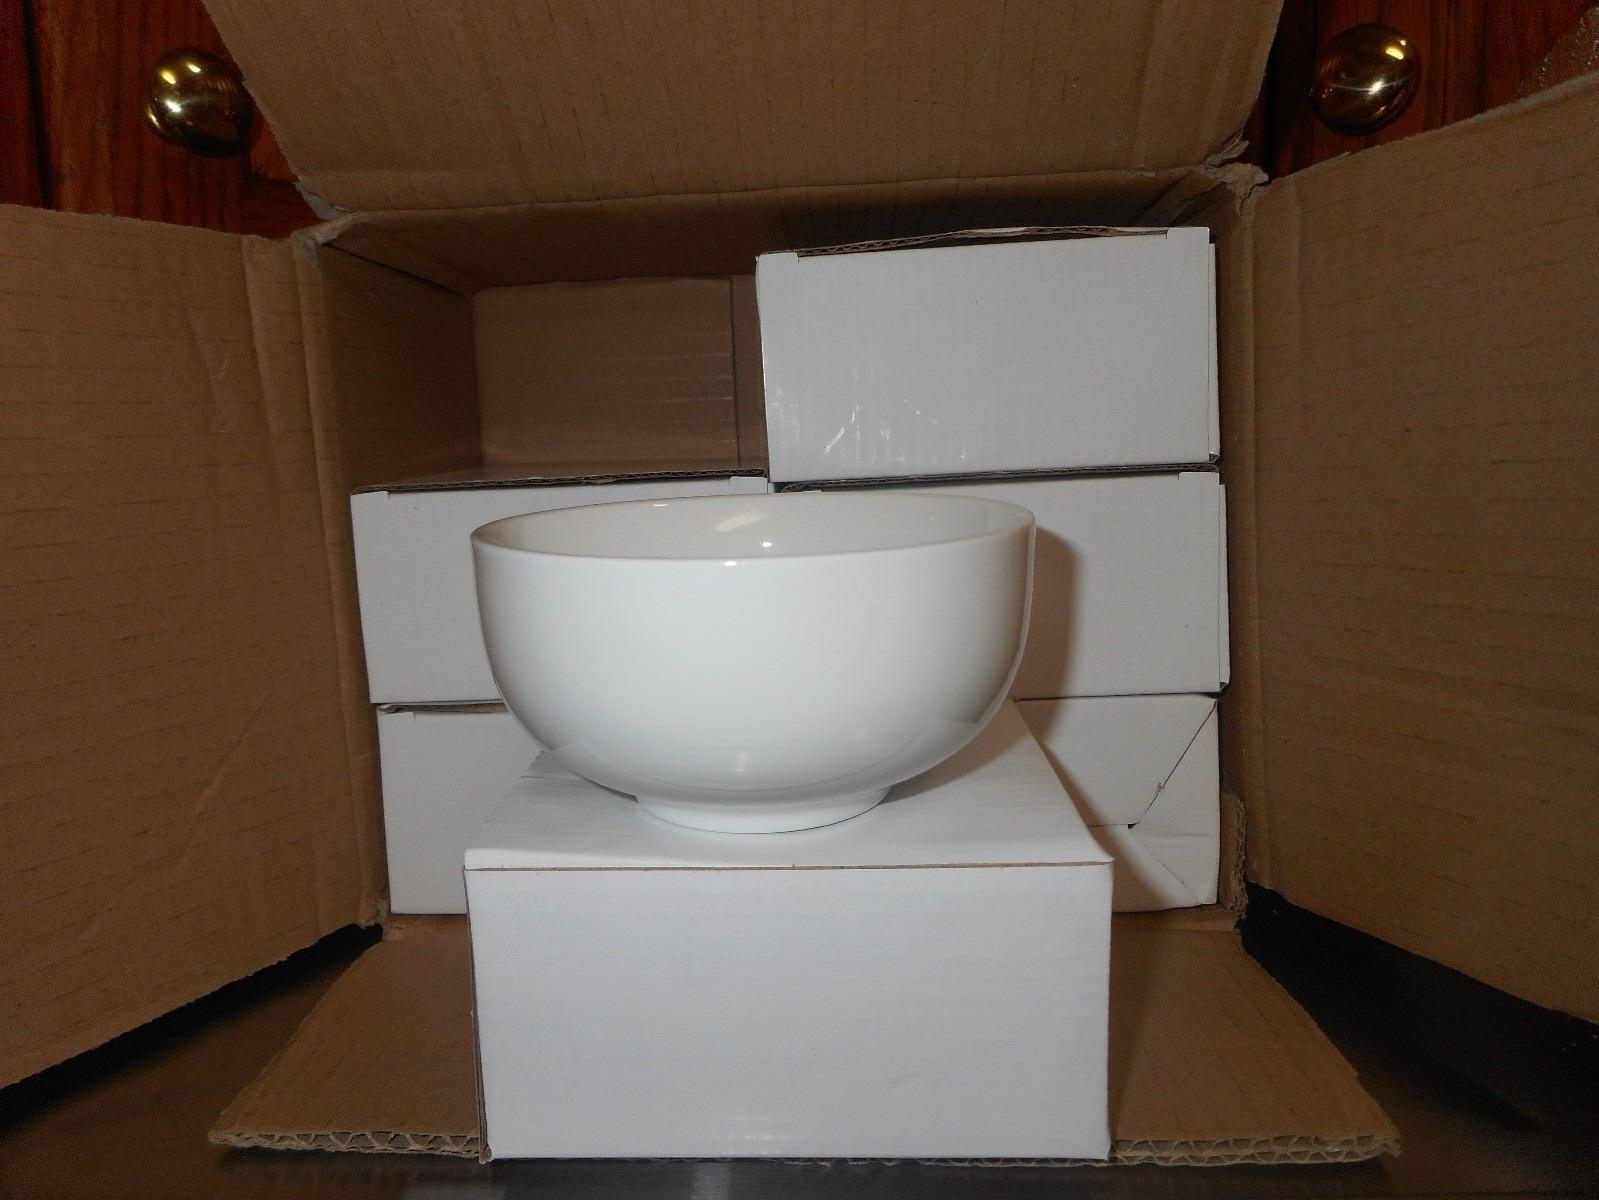 Oxford Set 6 12 oz. Bowls - High Quality Porcelain Pure White